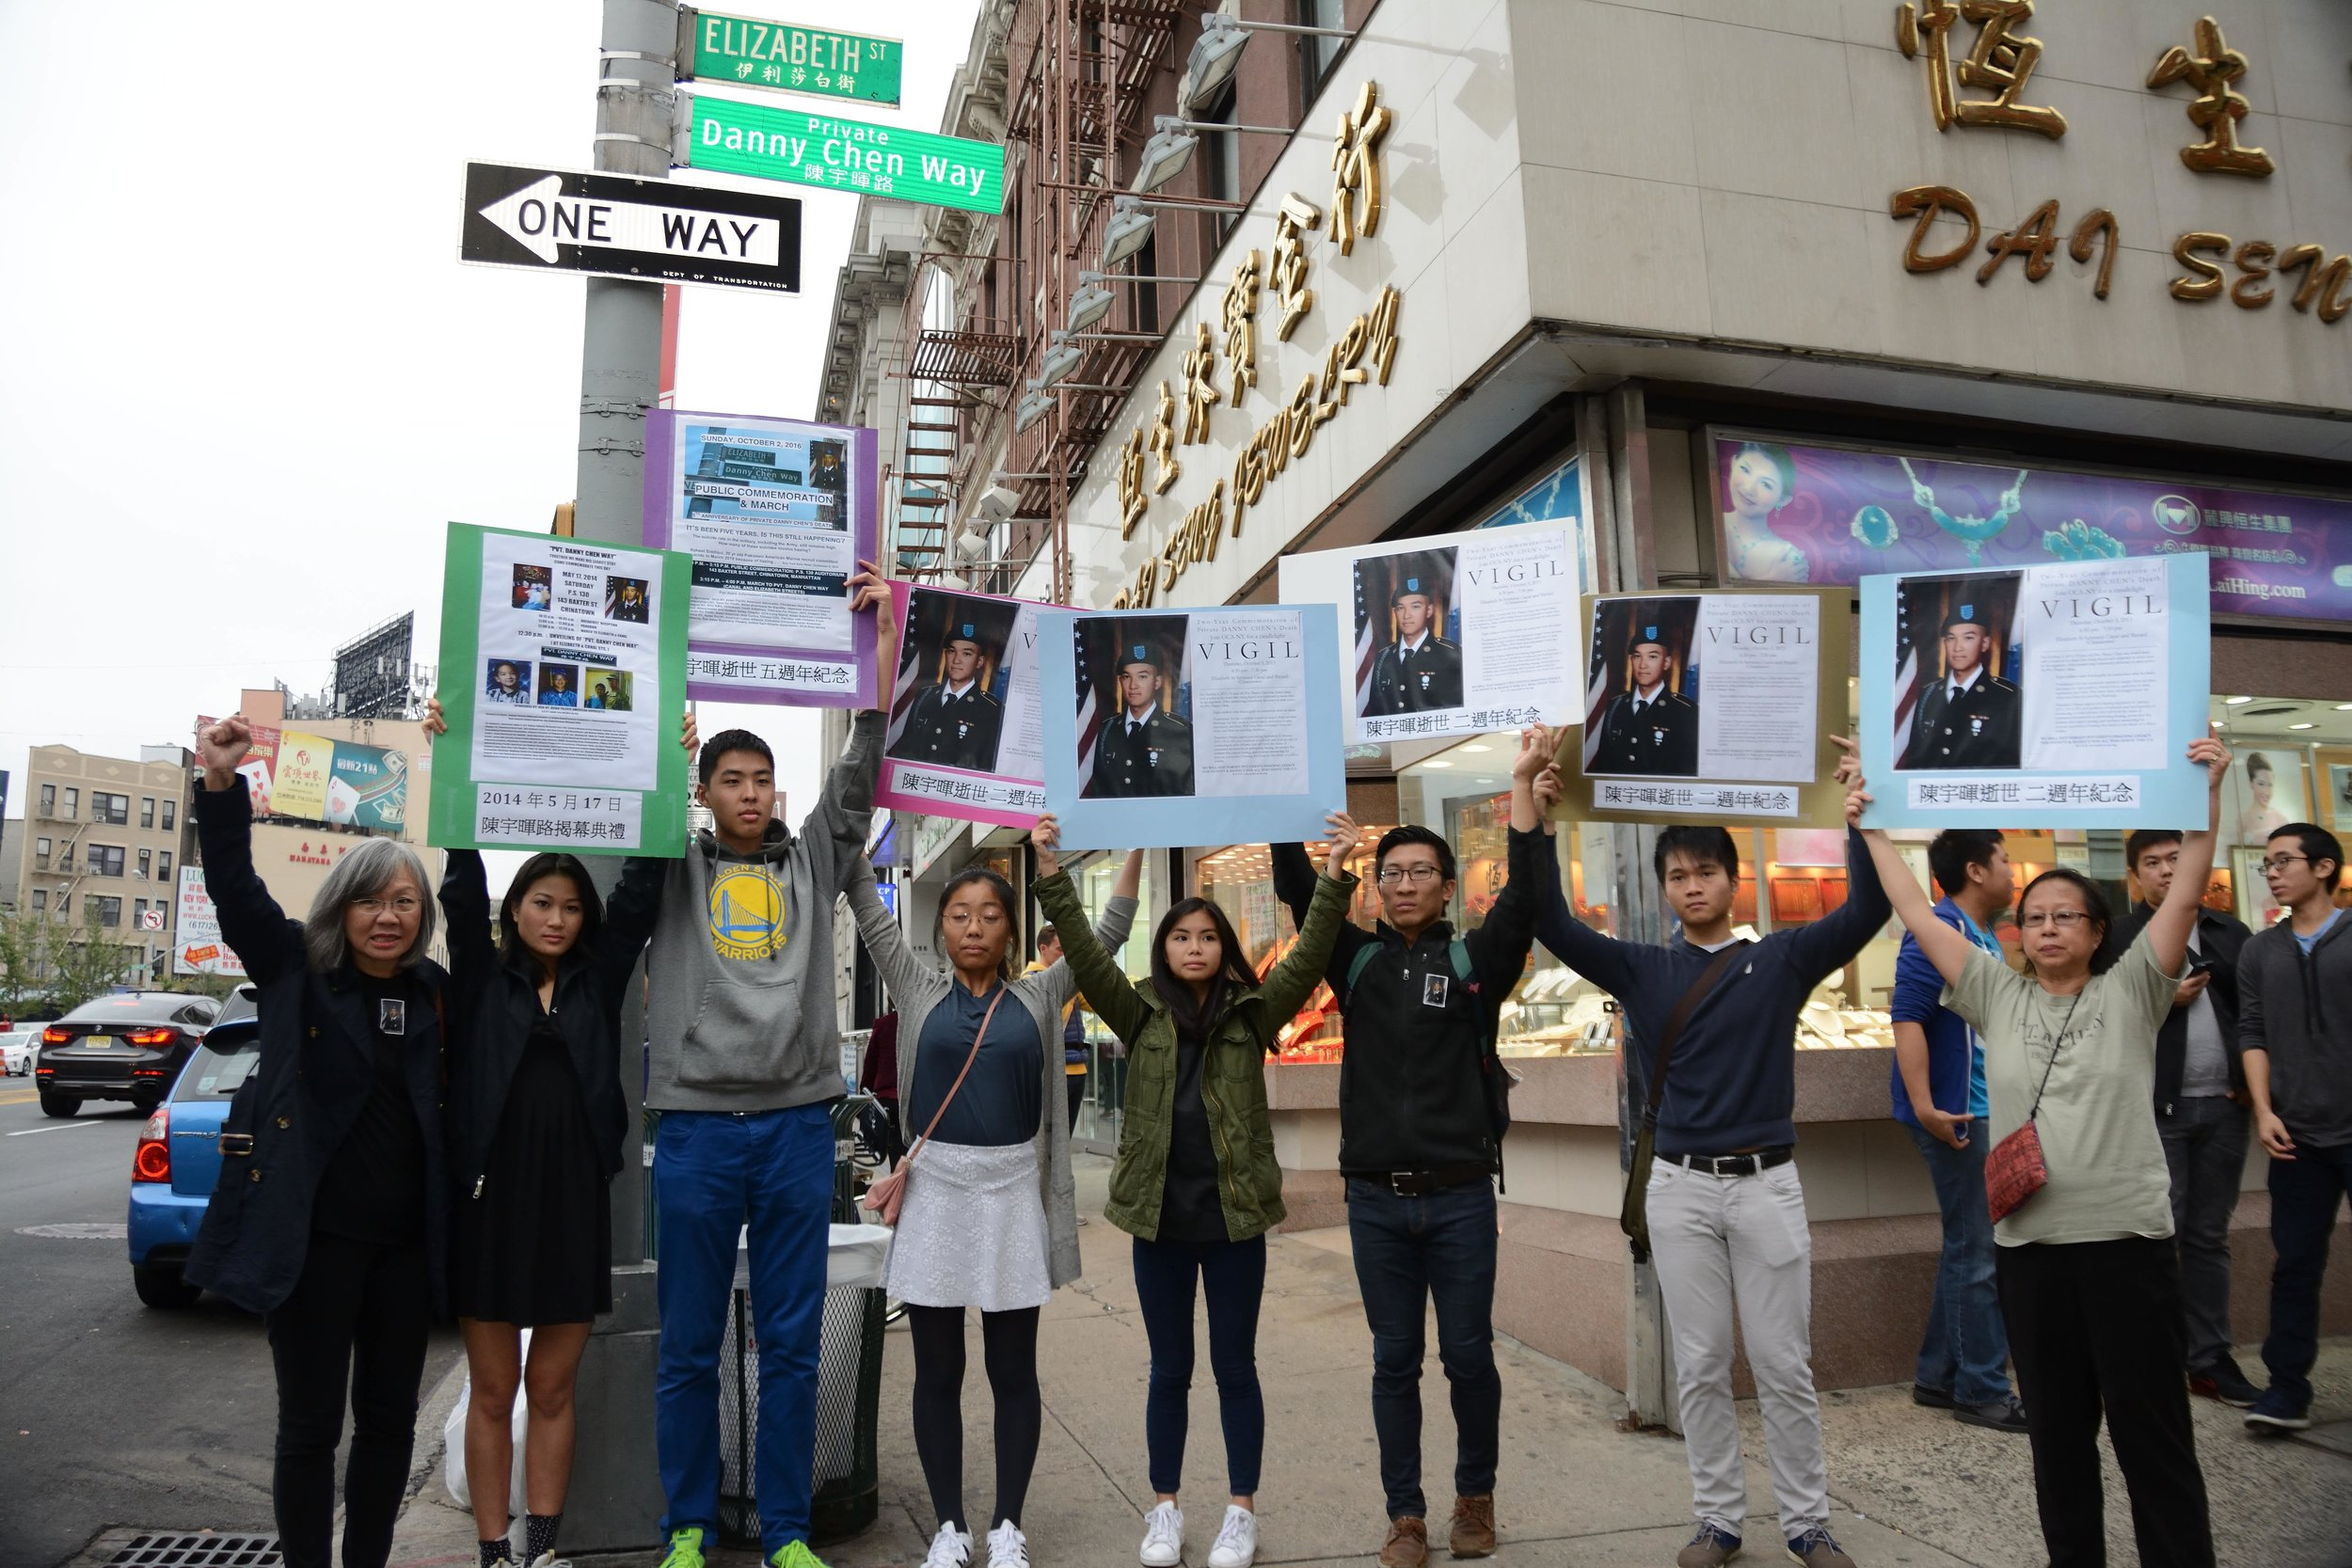 OCA - New York commemorating the 5th anniversary of Pvt. Danny Chen's death in New York City.